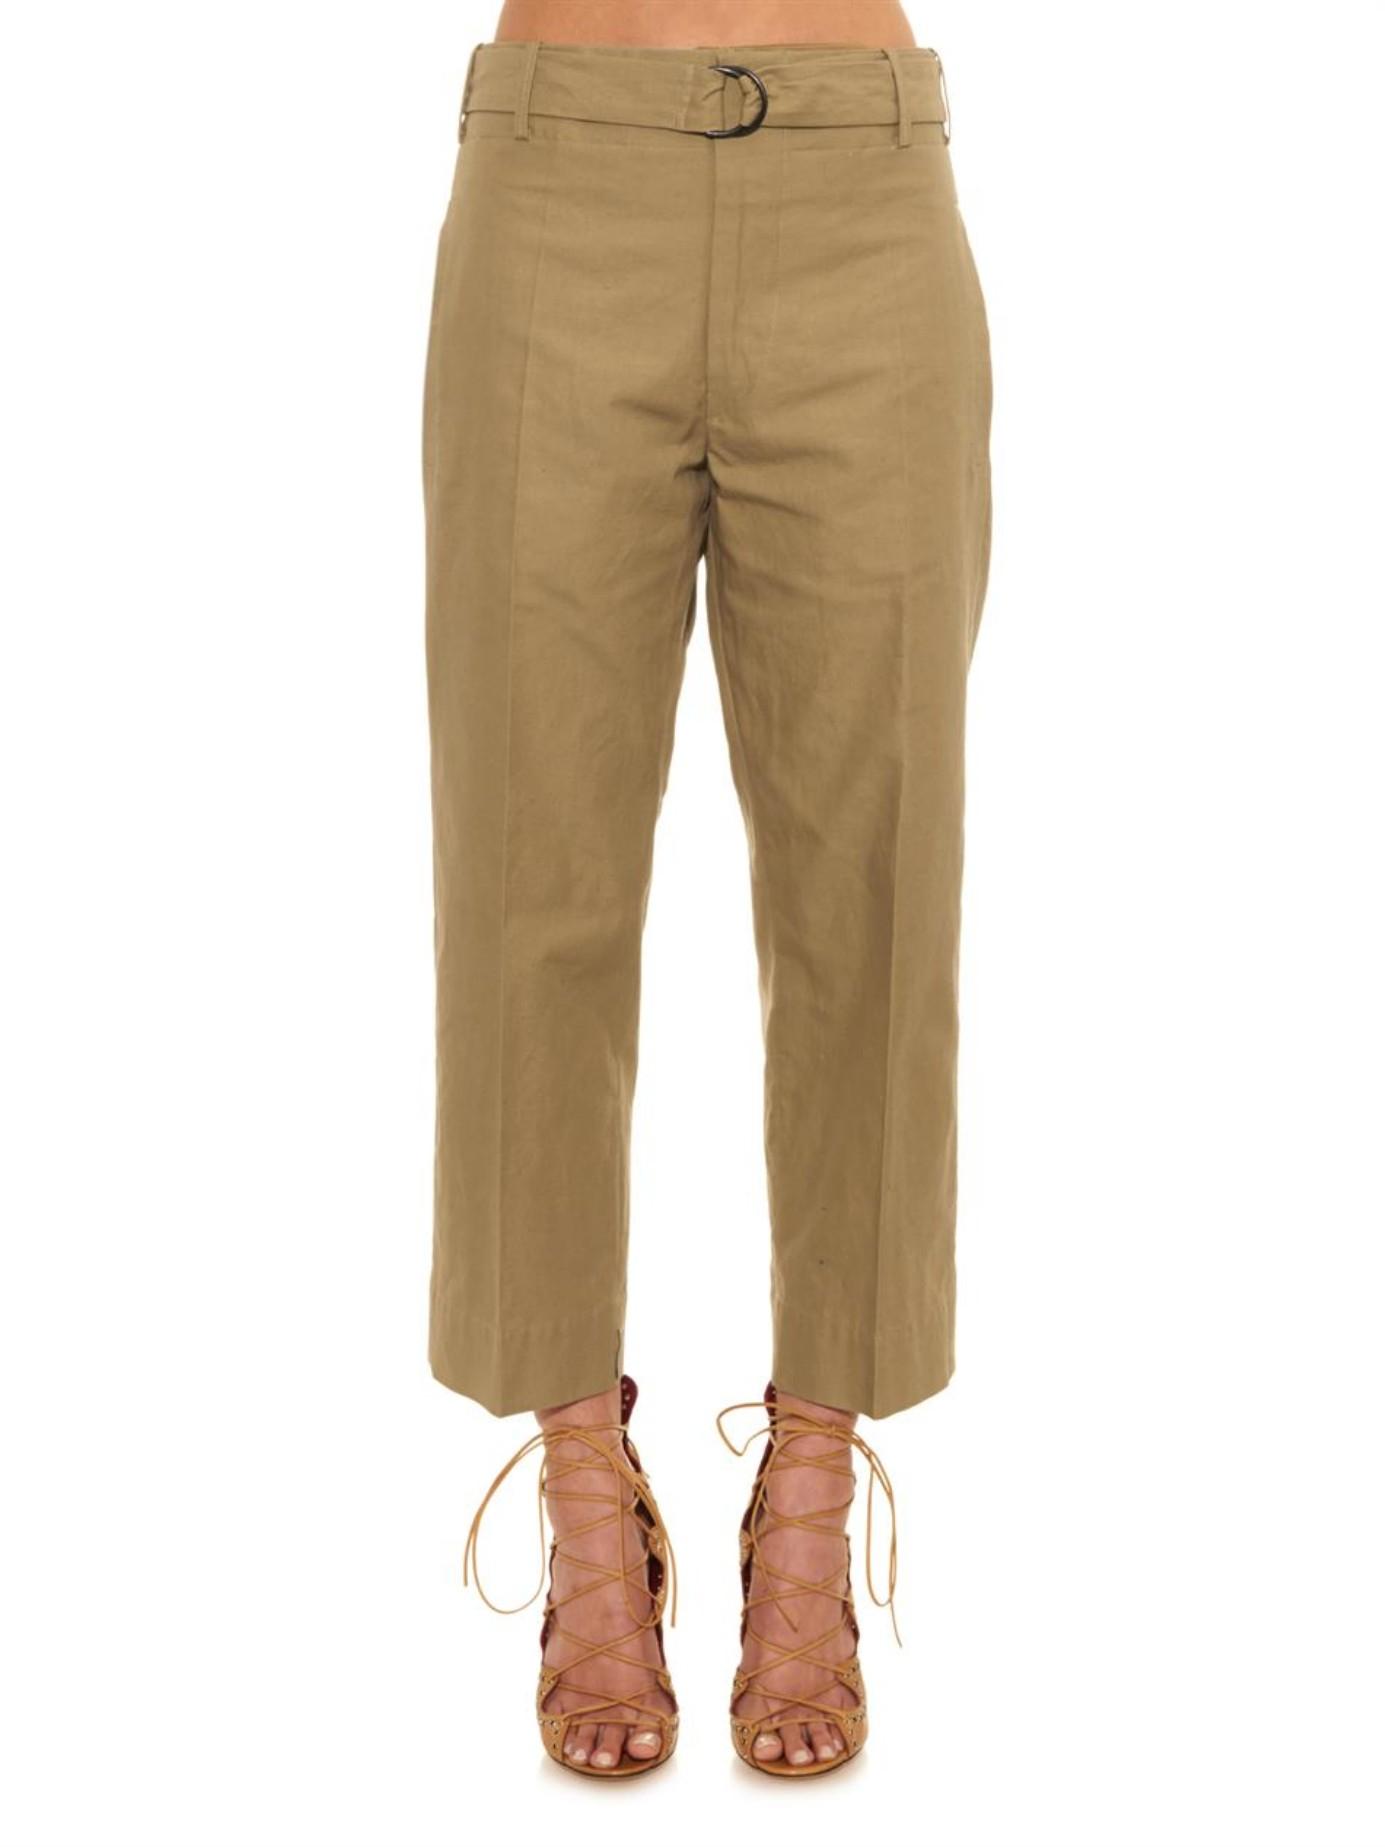 London Jean Linen Pants